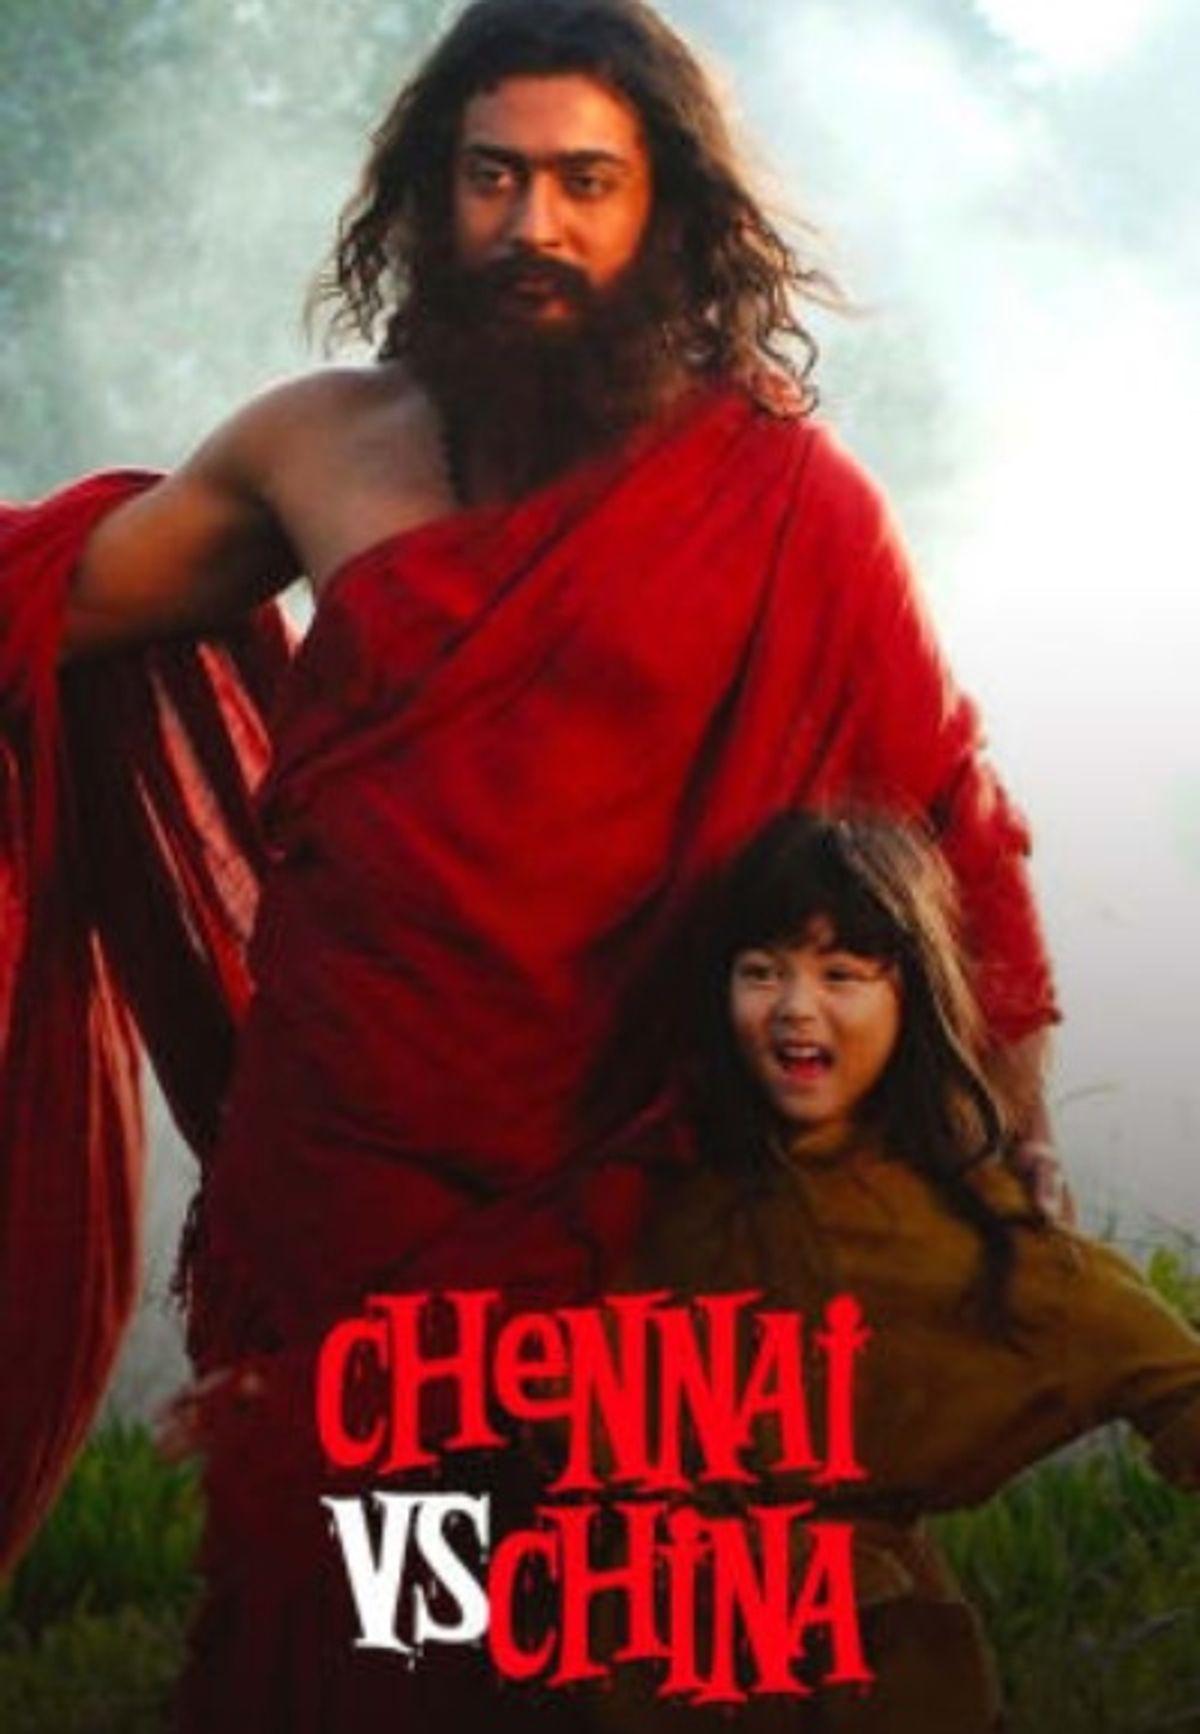 Chennai vs China